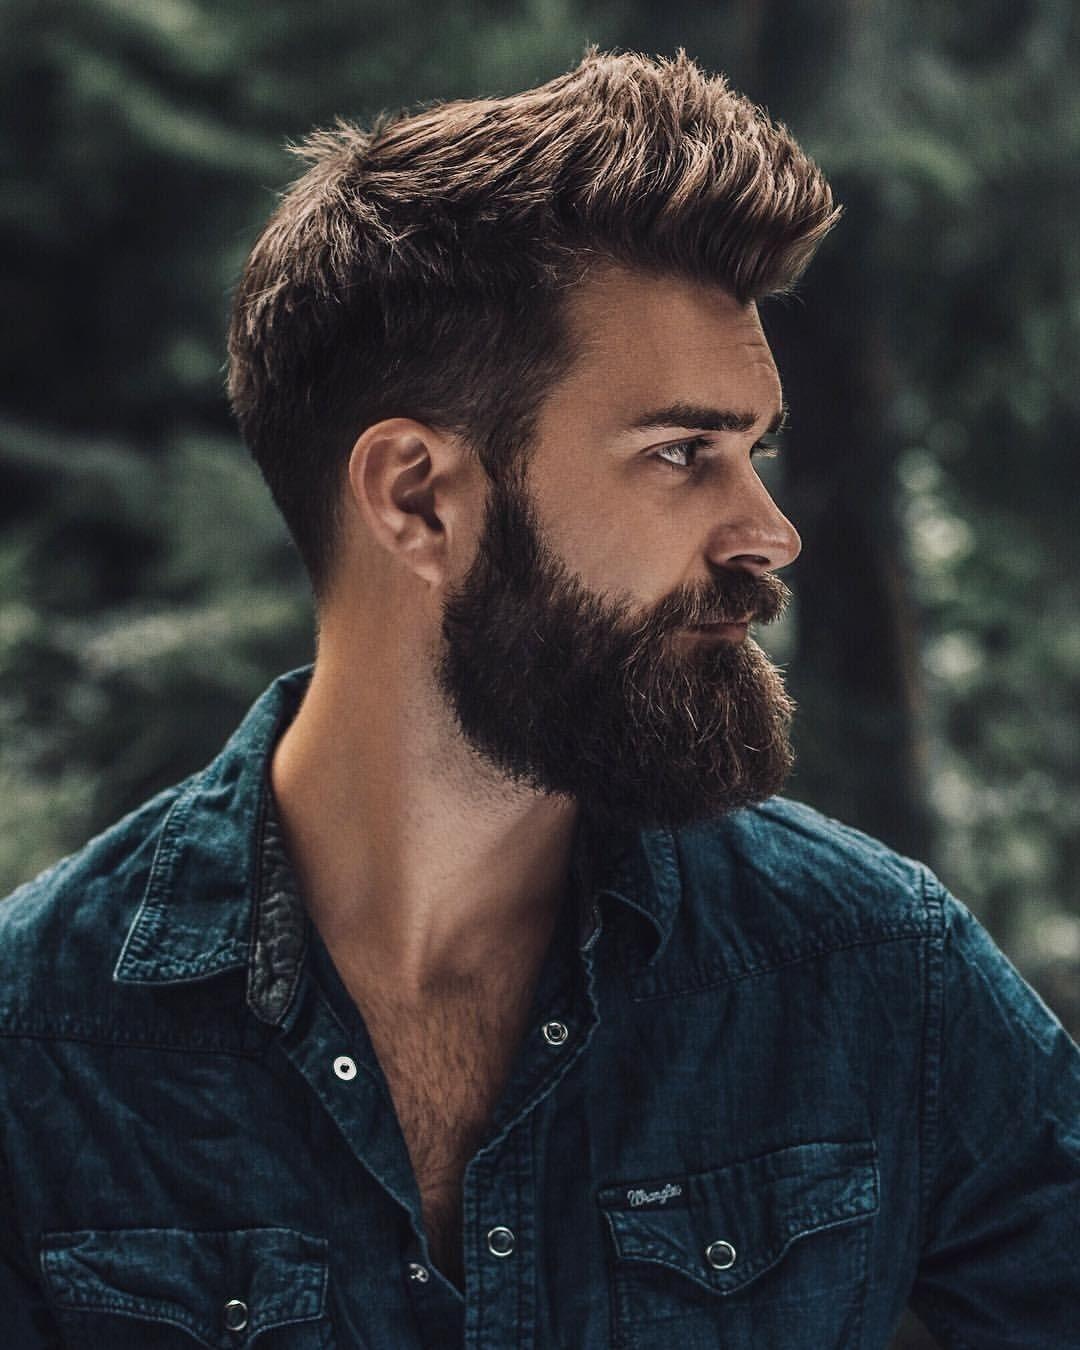 Pin by luciano rivera atocha on stylo de corte pinterest beard